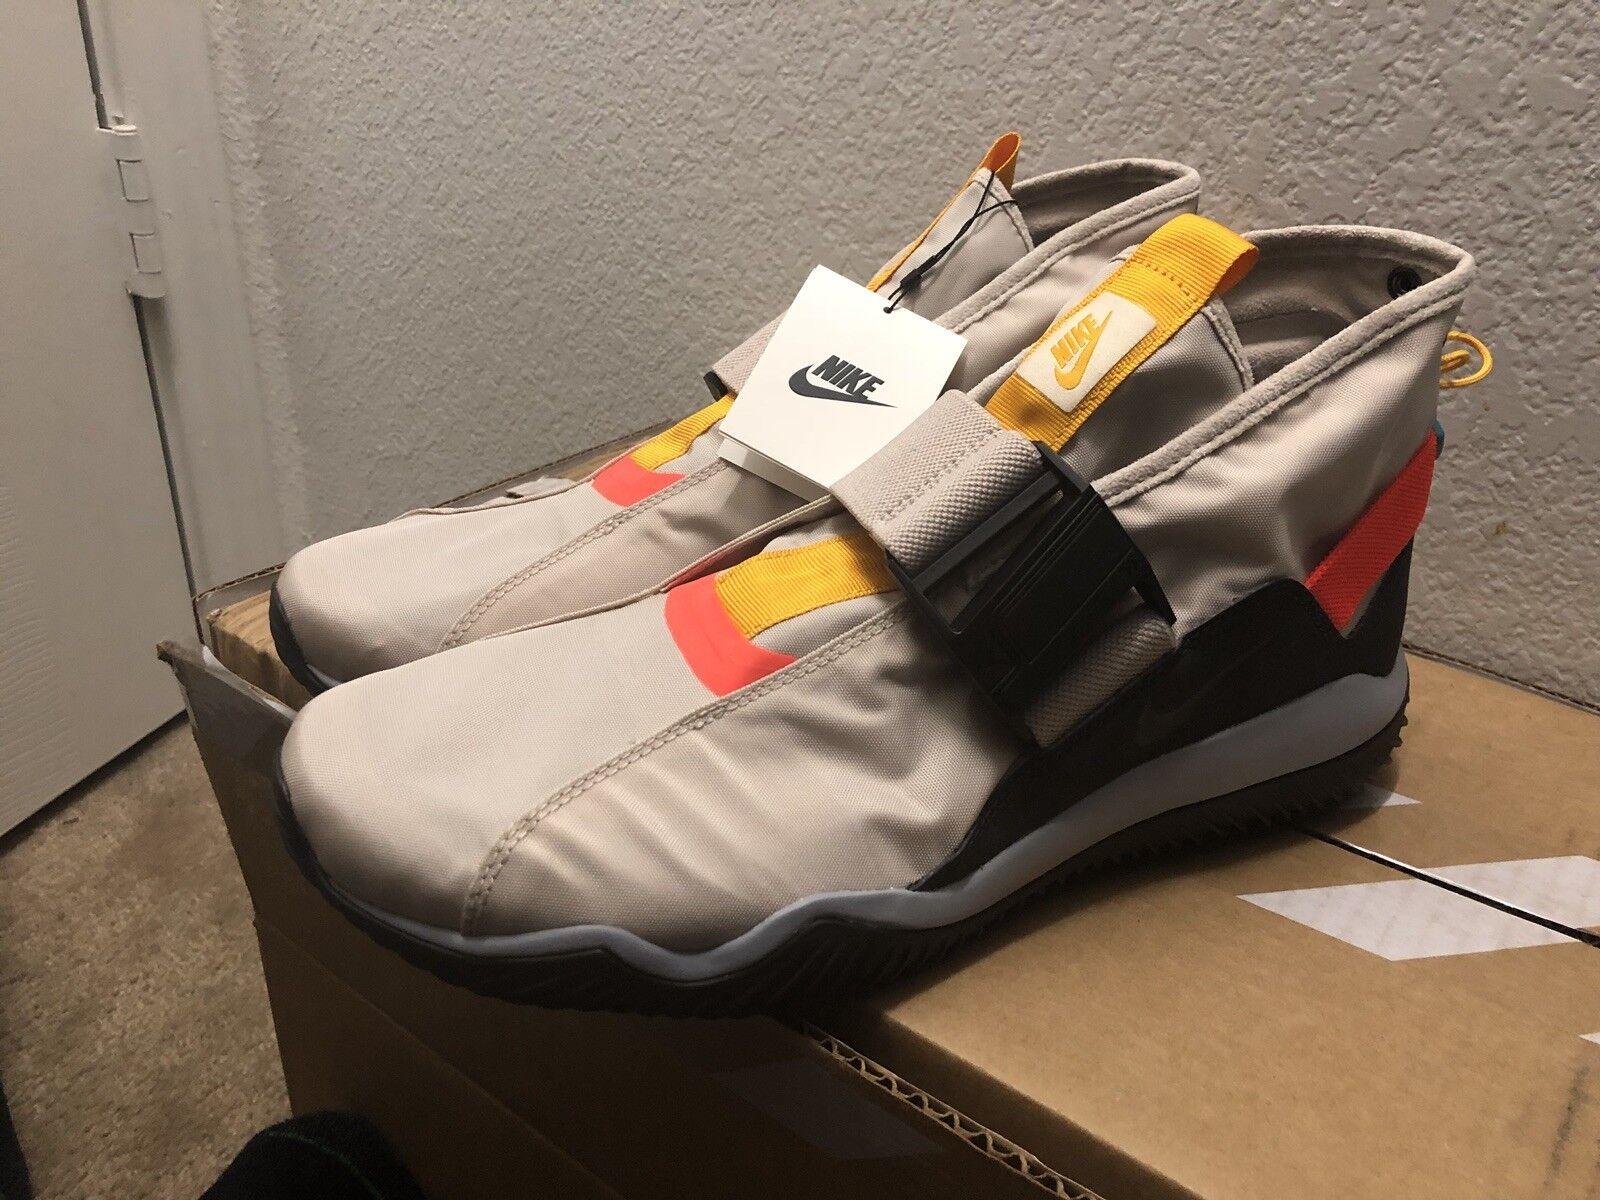 Nike Komyuter SE Shoes KMTR Birch Khaki Brown AA0531 200 Men's Comfortable